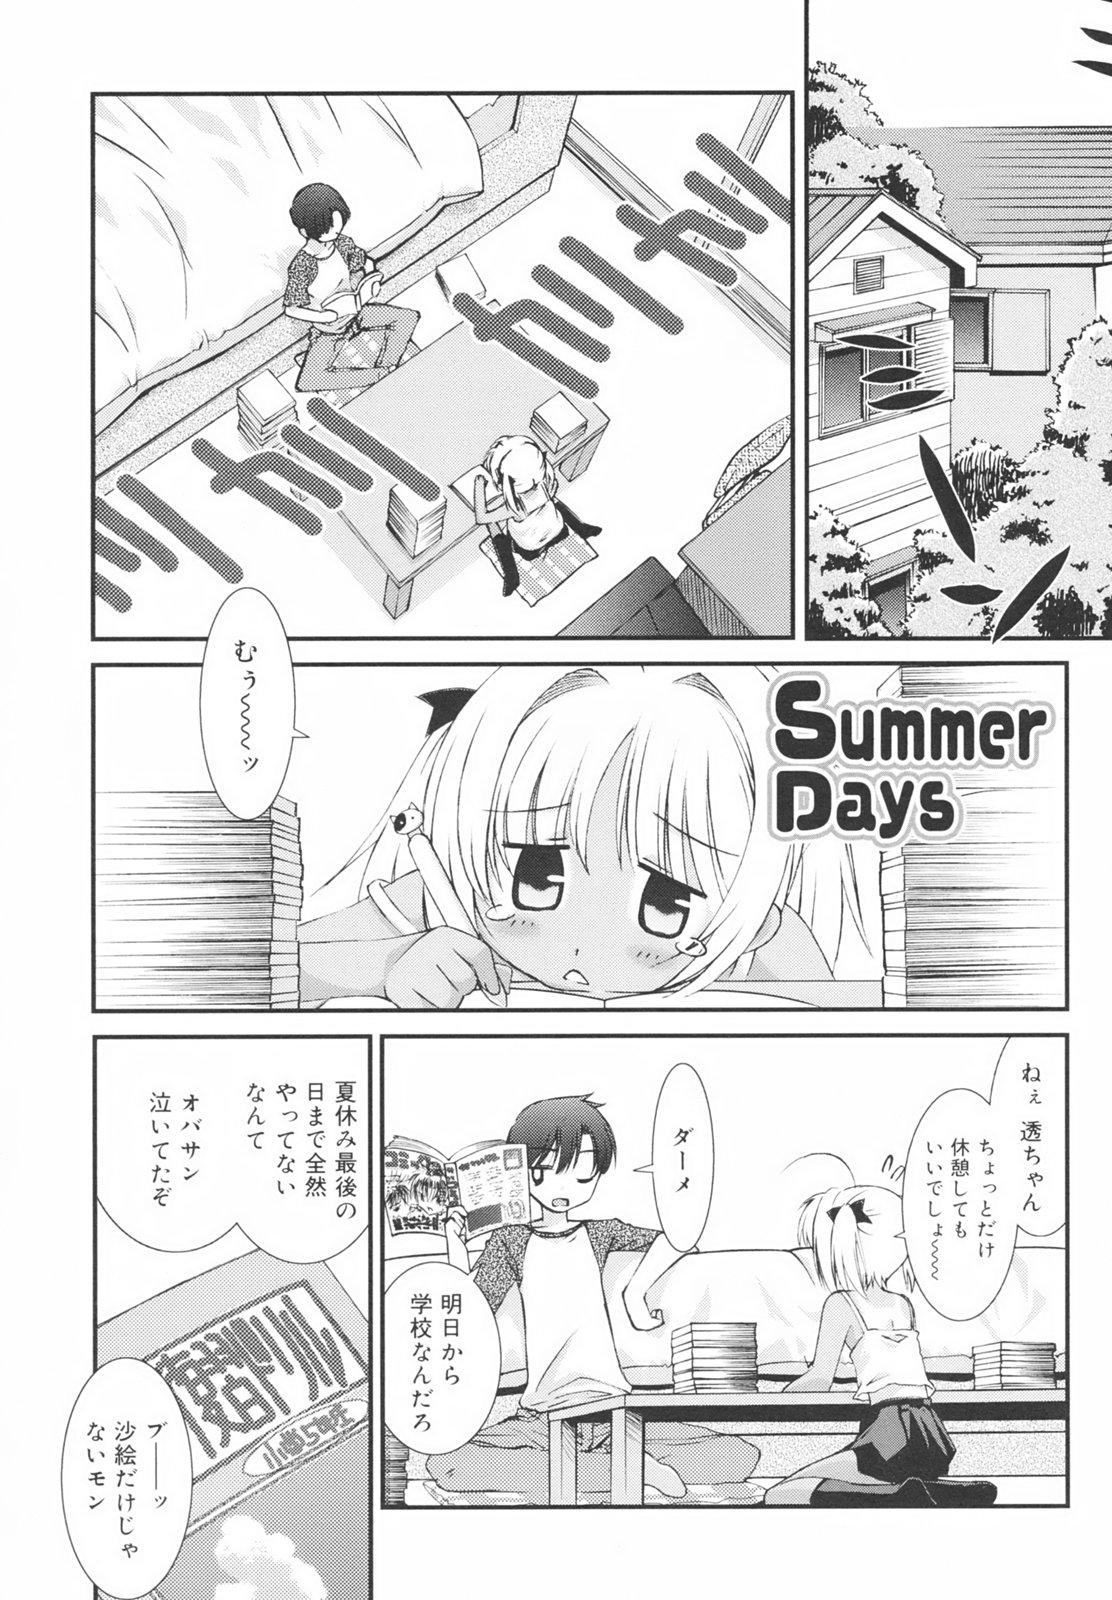 Gakkou No Nai Hi - A Day without School 84